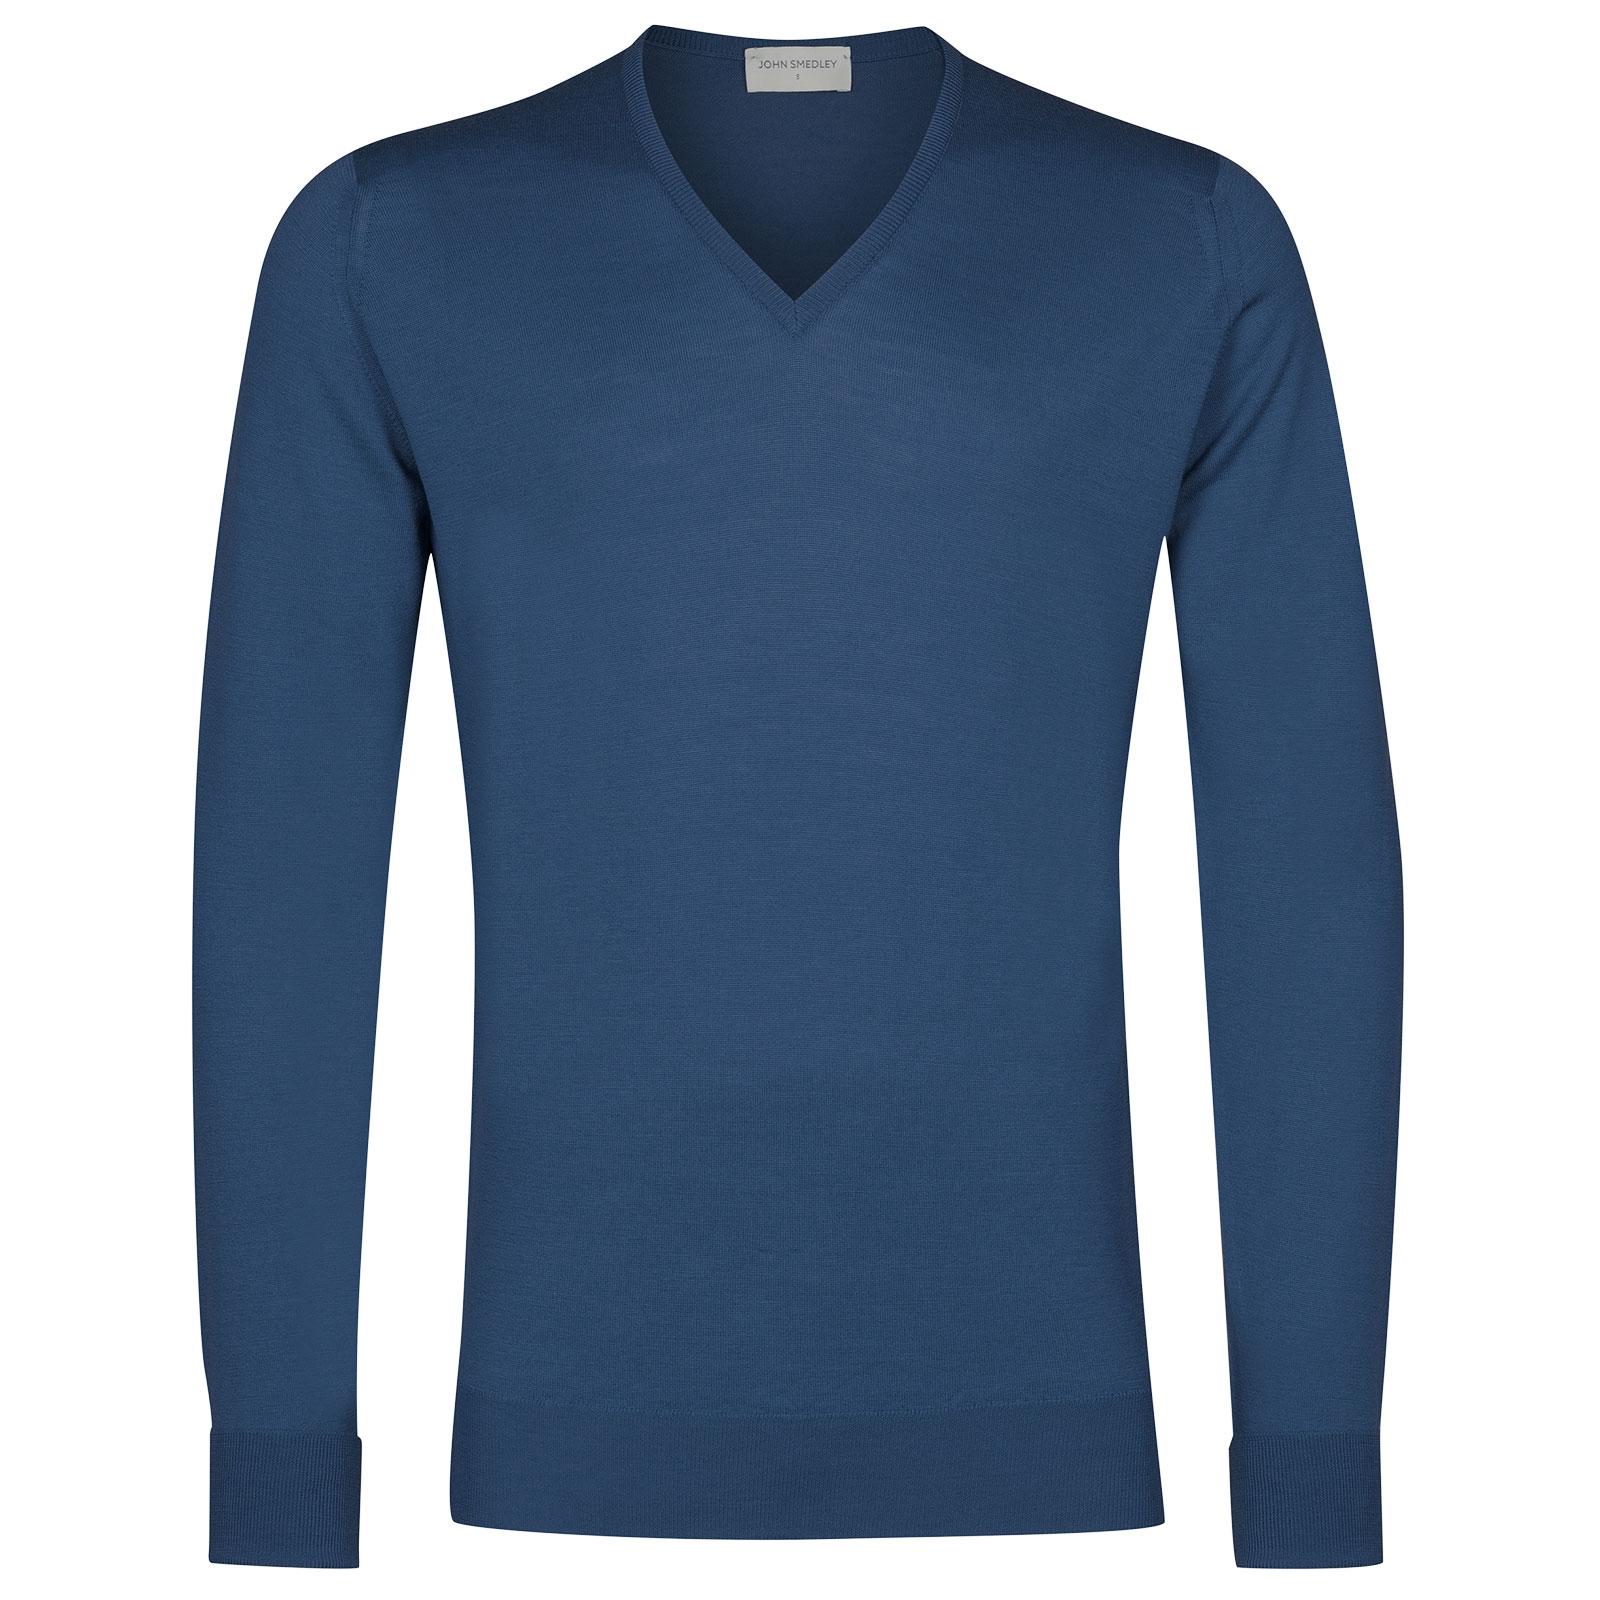 John Smedley bobby Merino Wool Pullover in Derwent Blue-L